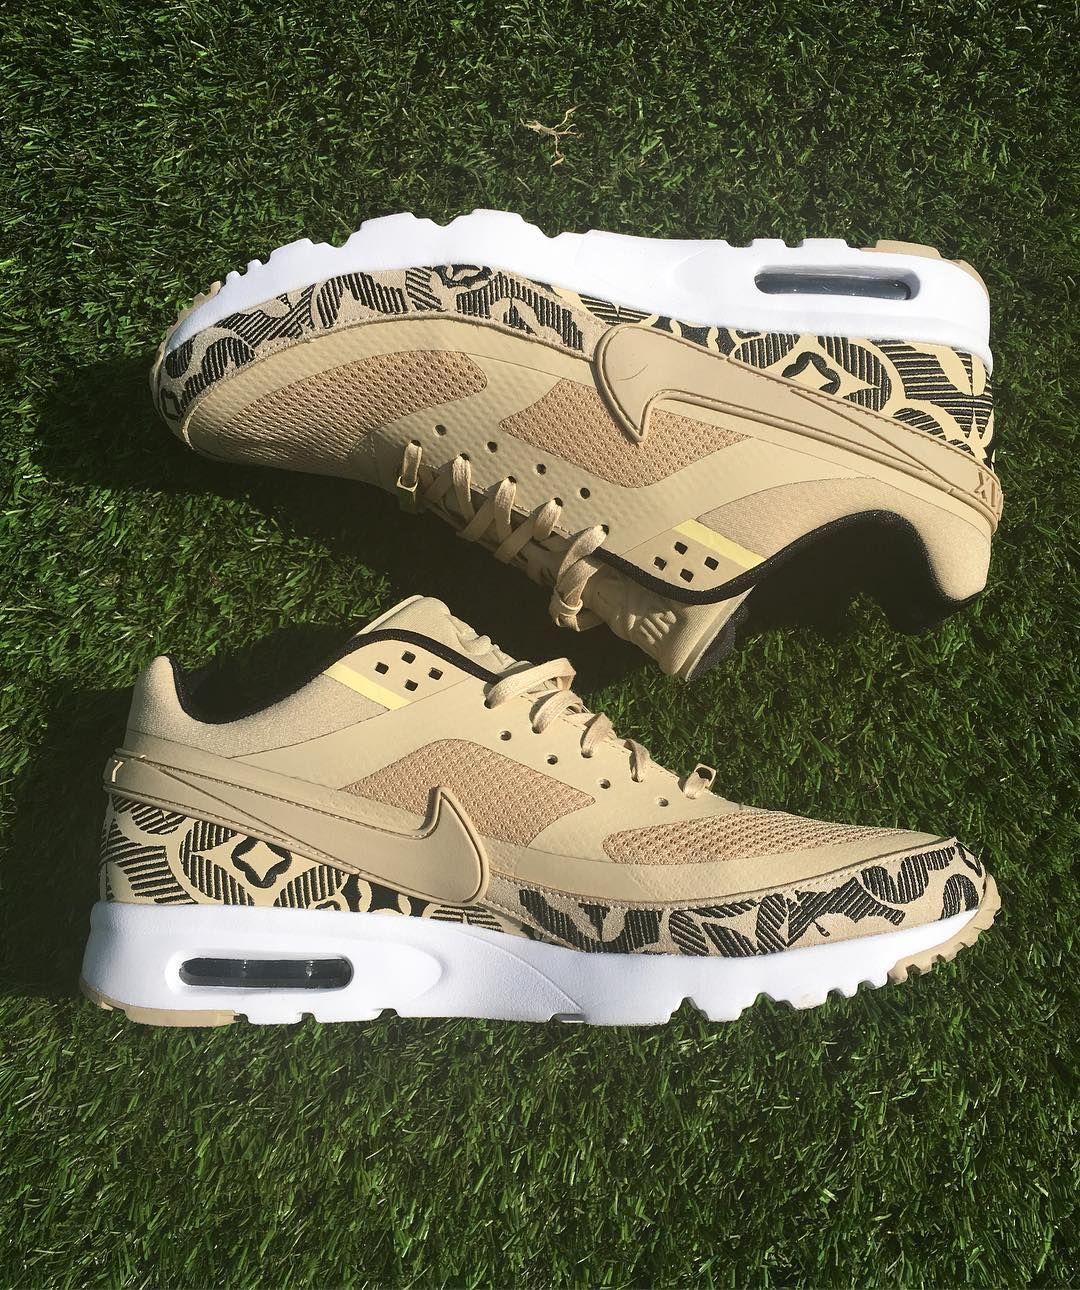 Excesivo Fragua restante  Crème de la Crème #todayskicks #nikeultra by officialjdunn | Nike air max,  Sneakers nike, Nike